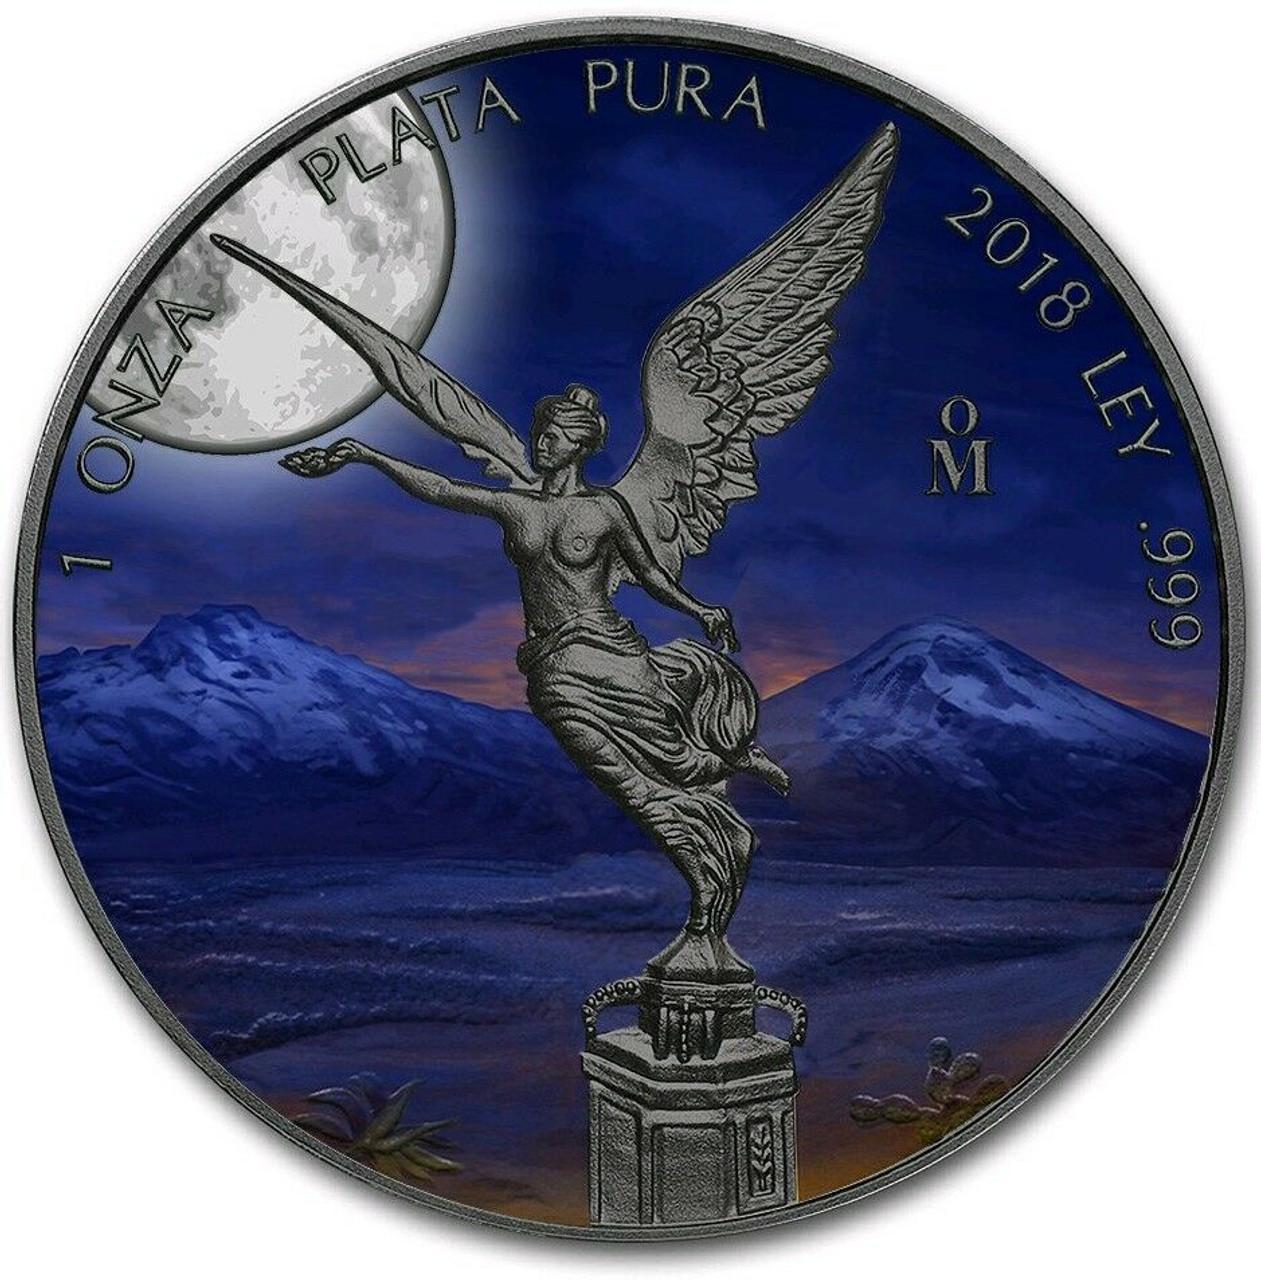 2018 1 Oz Silver Mexican MOONLIGHT LIBERTAD  Ruthenium Coin.